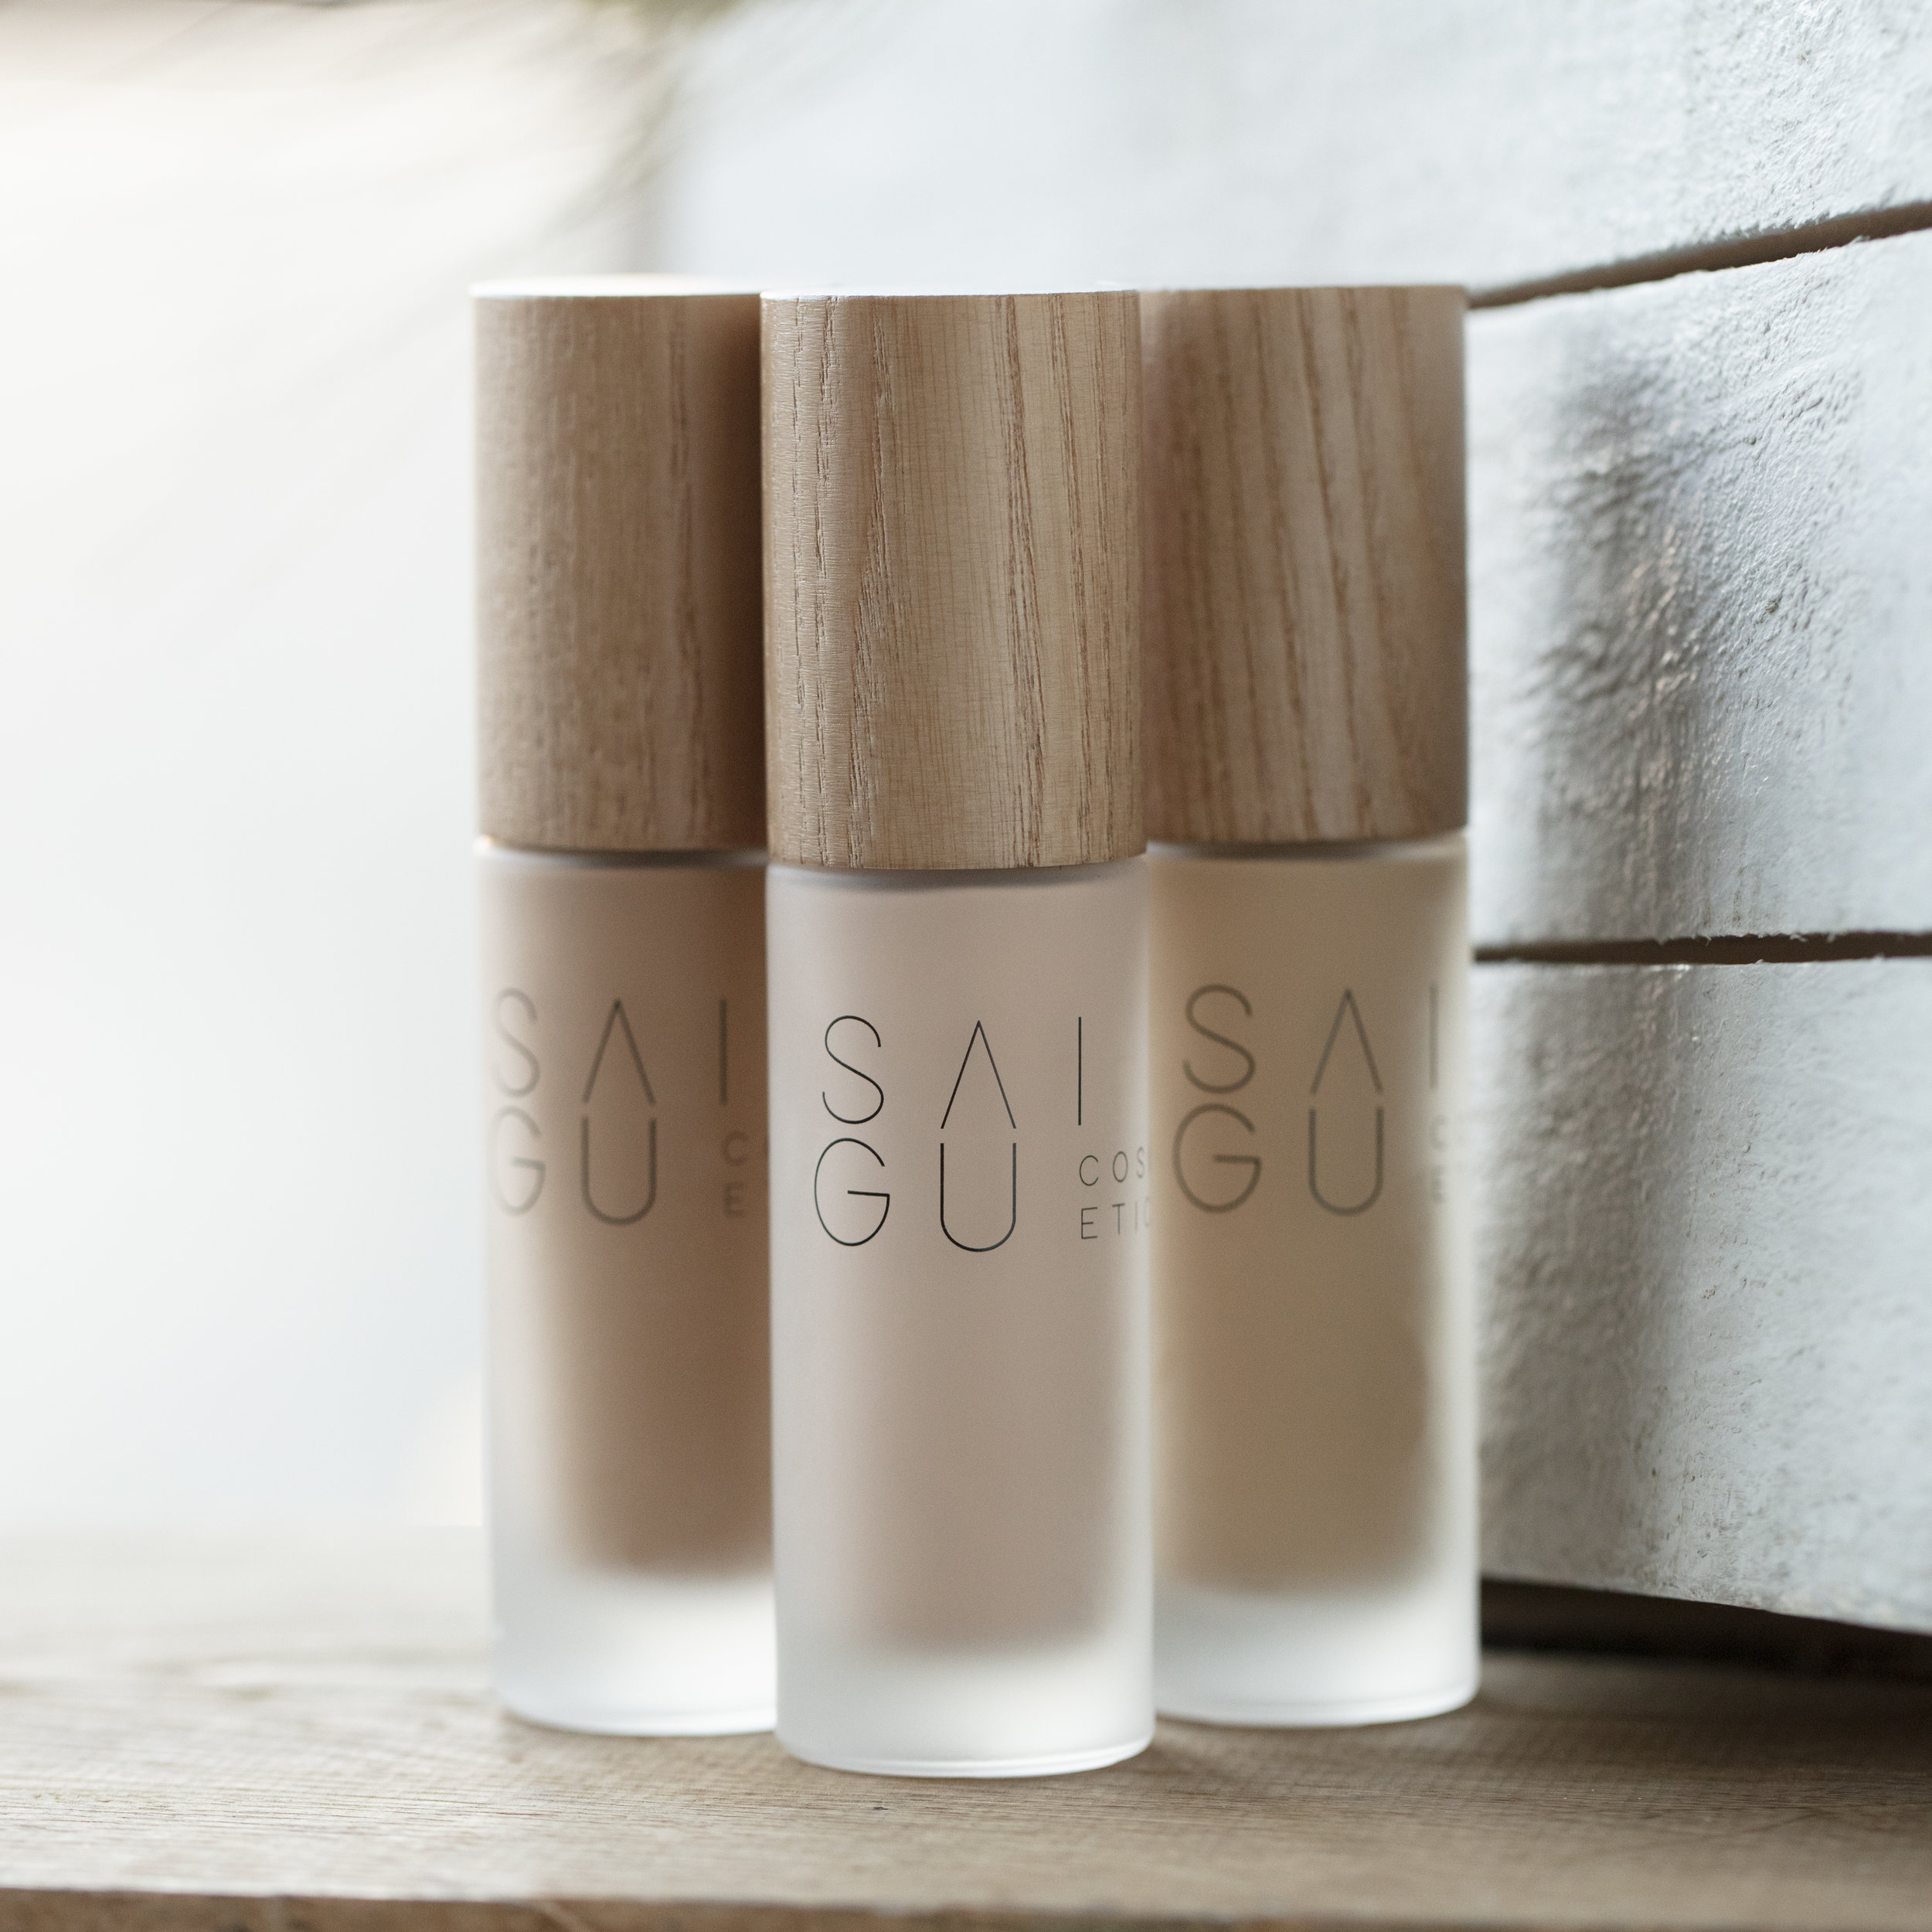 saigu-cosmetics-redes-sociales-19.jpg